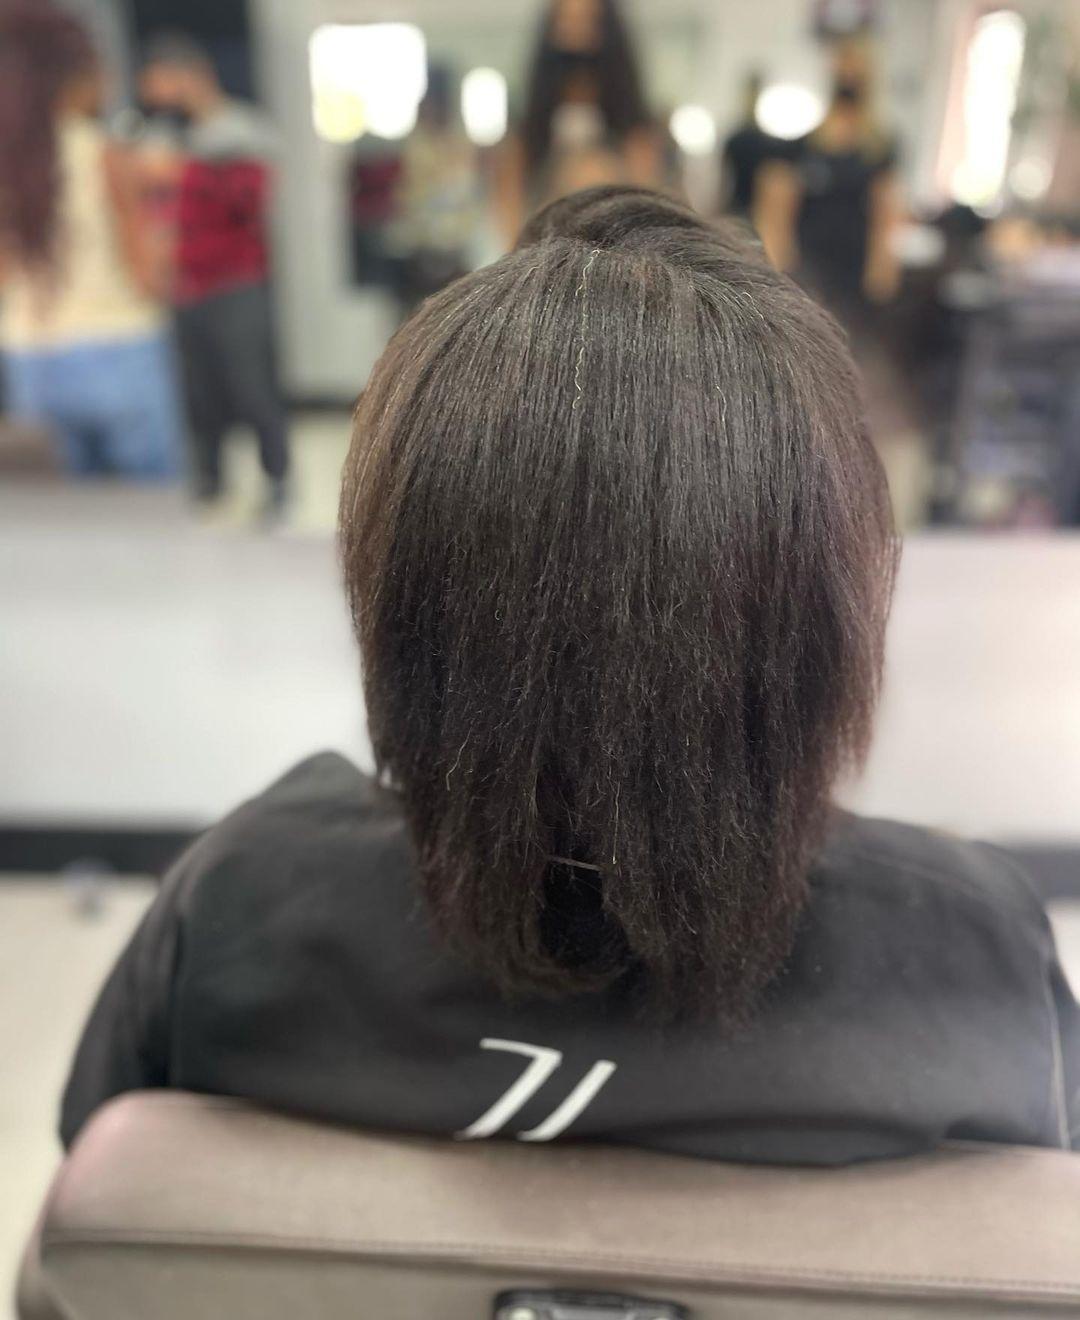 Partes de trás do cabelo natural de Lumena.